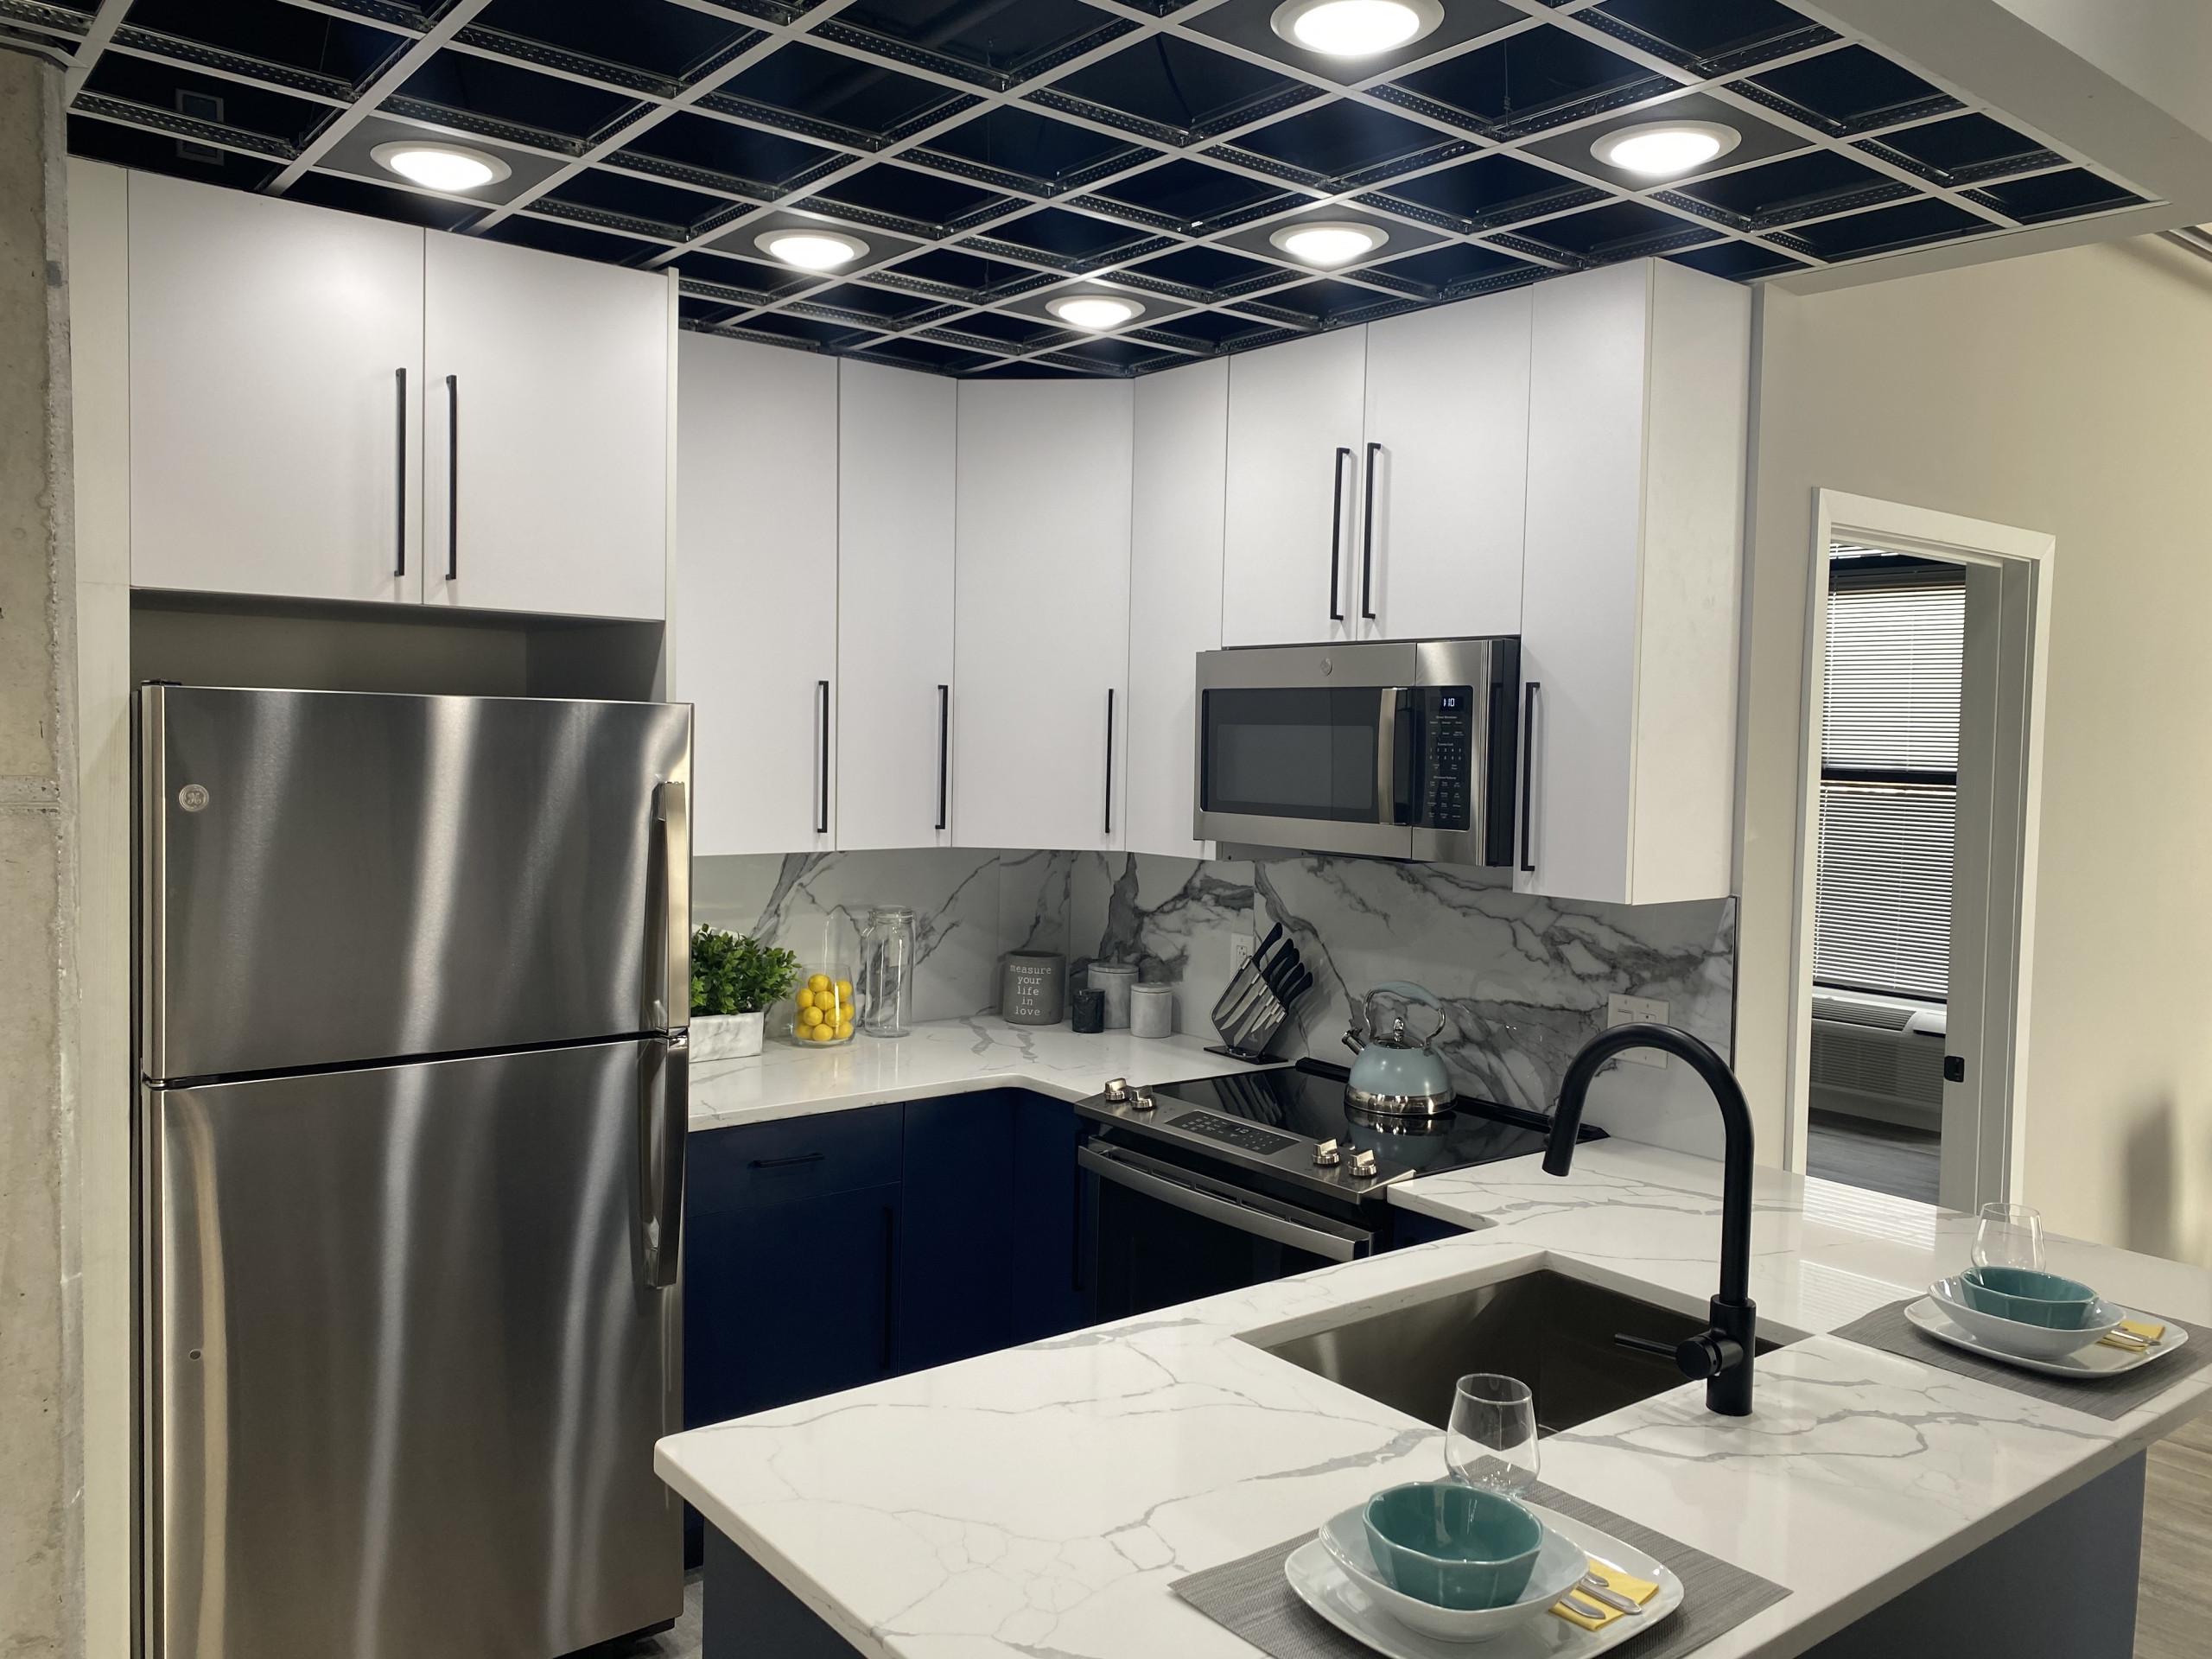 j street lofts phase 2 profile model apartment kitchen